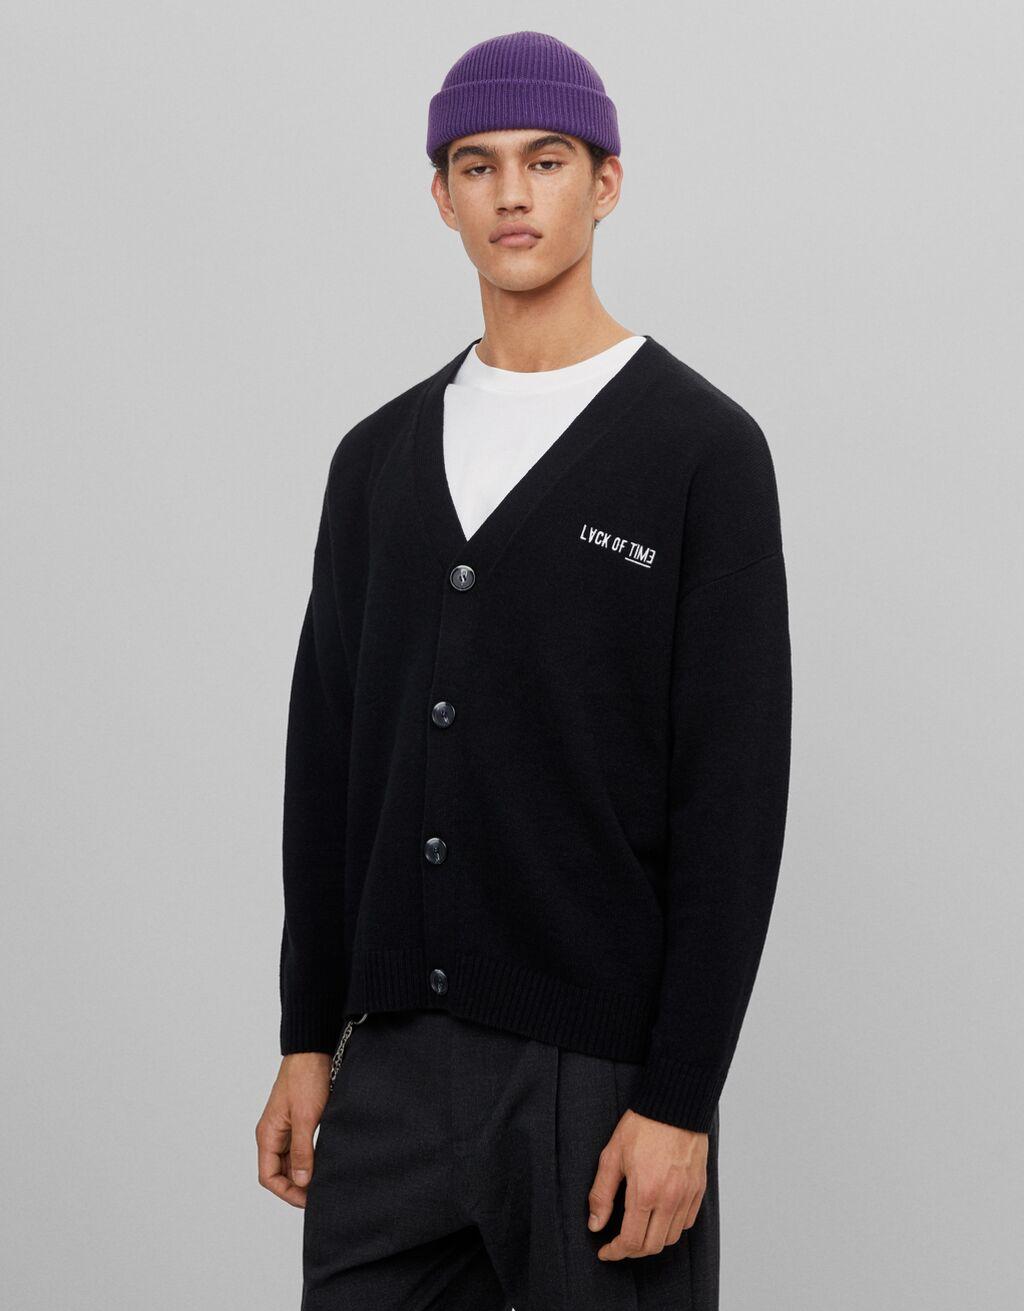 Knit cardigan - Sweatshirts and sweaters - Man